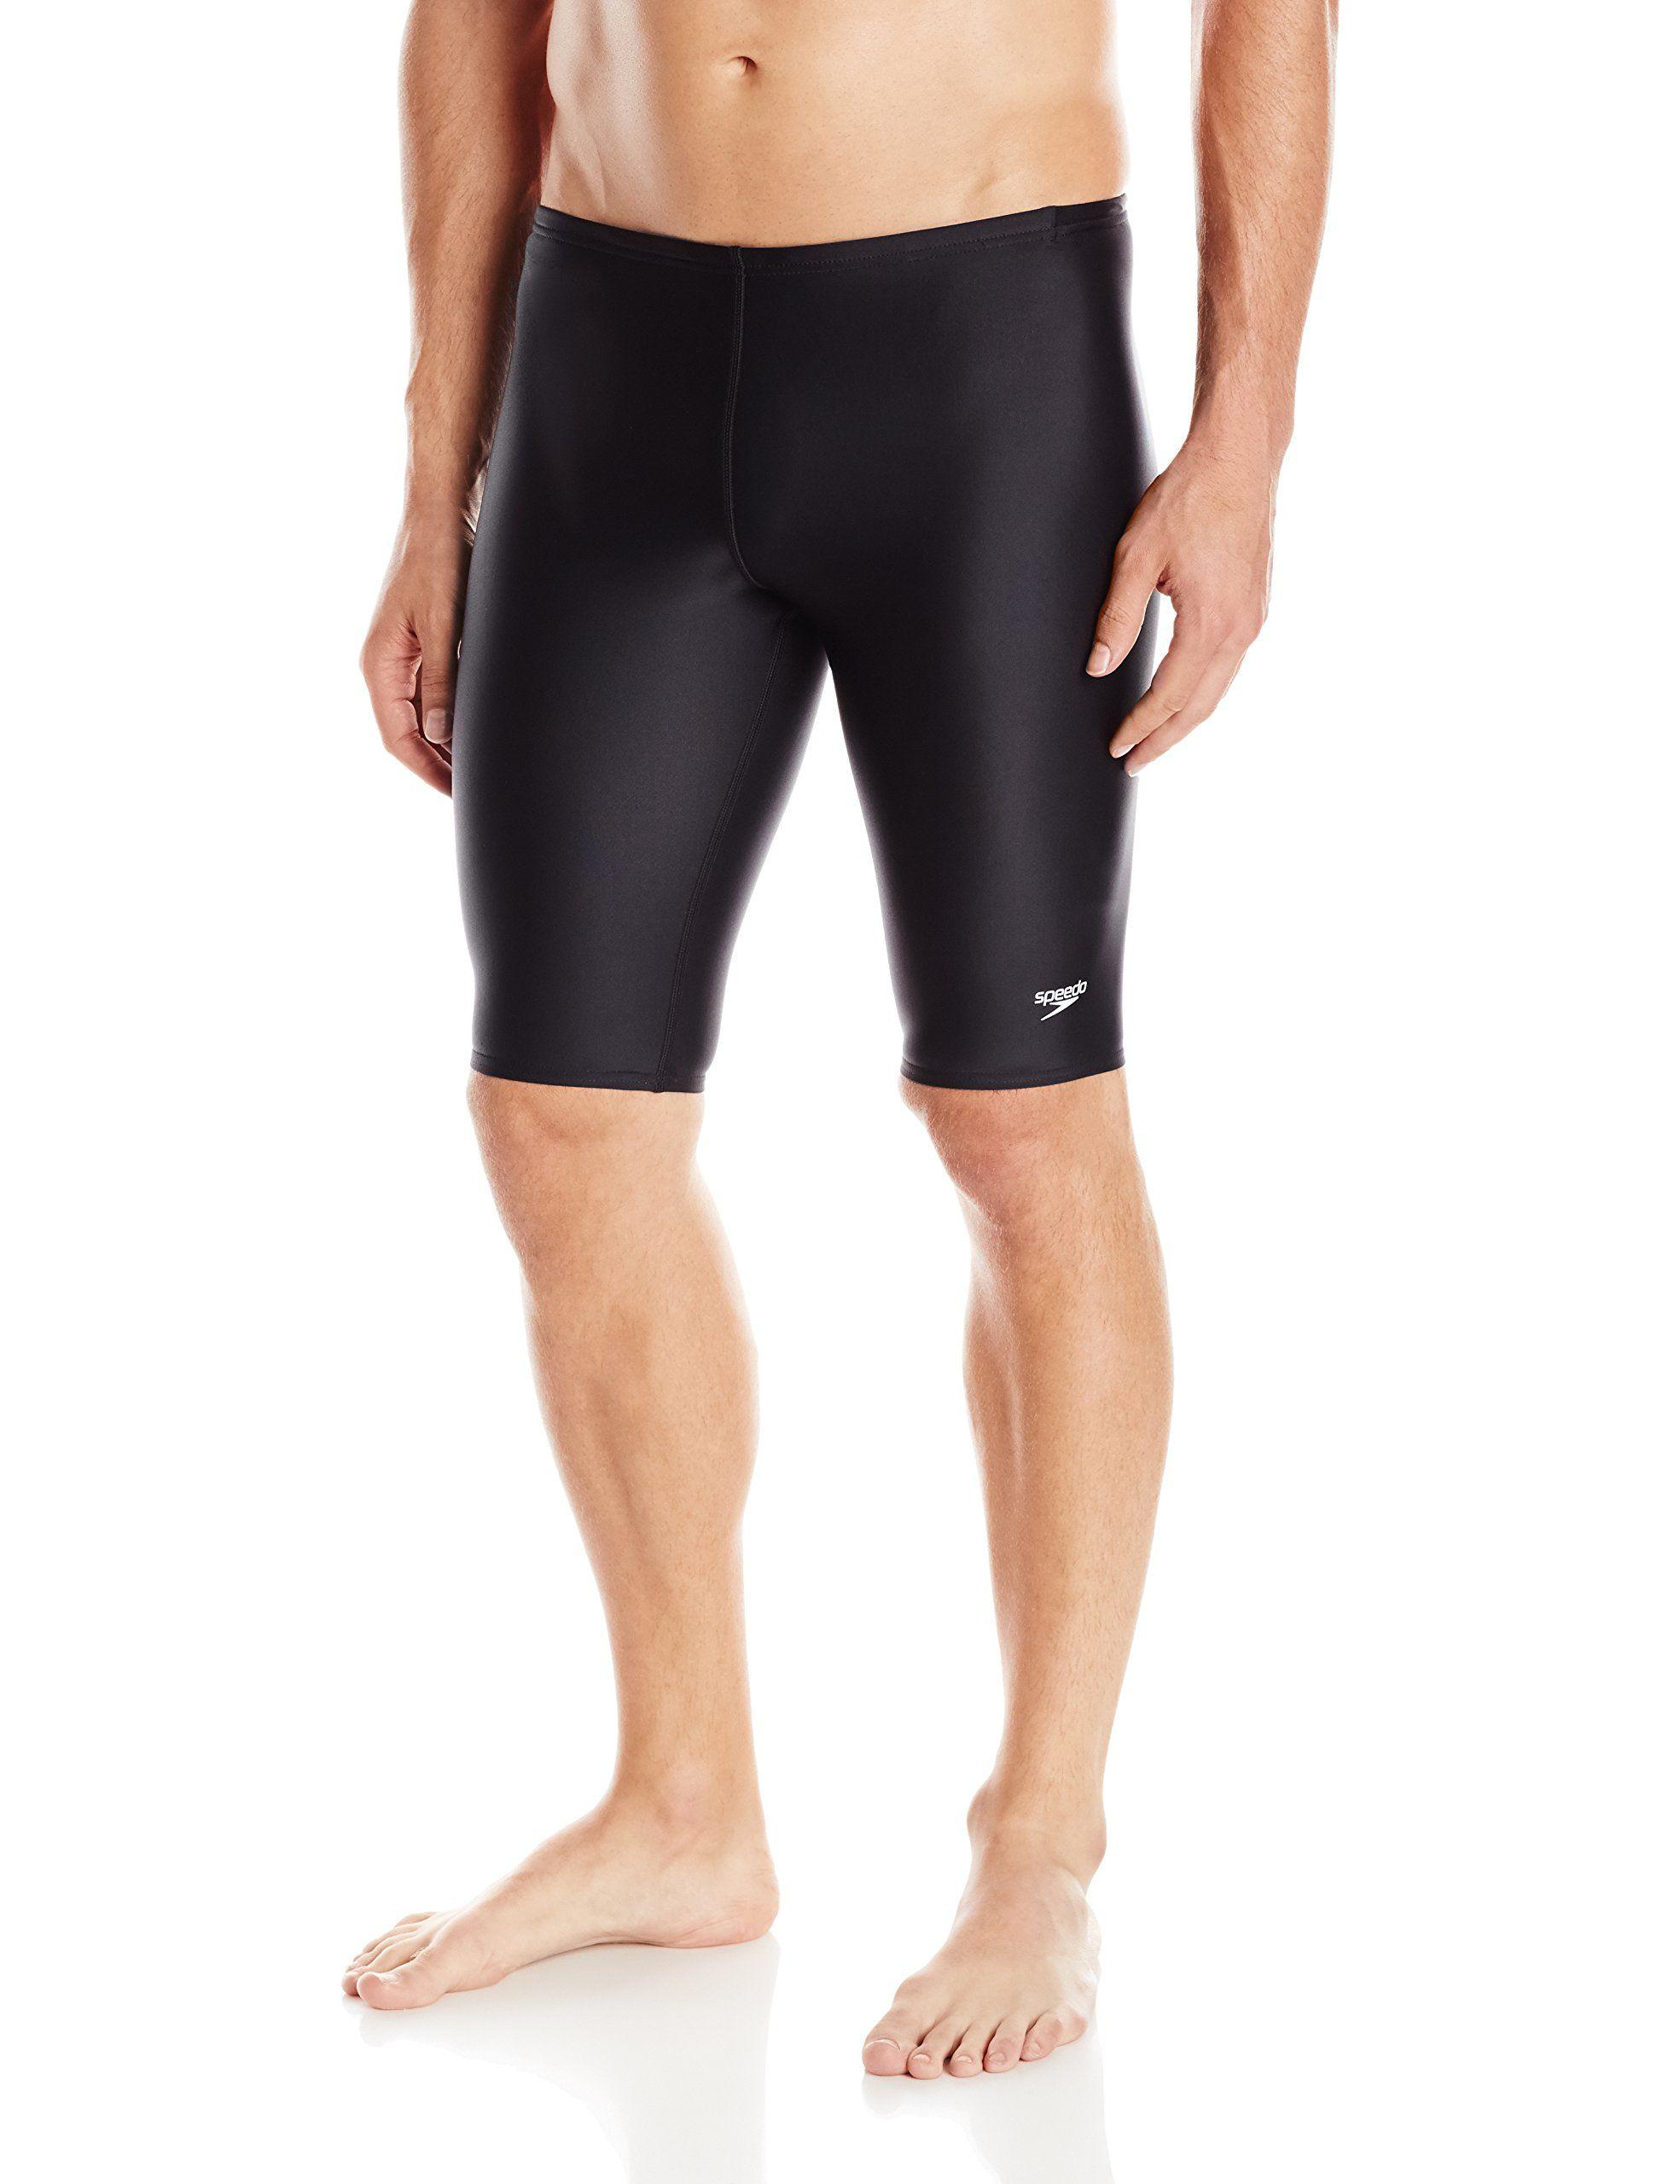 c548f808bdbe6 Speedo Men s PowerFLEX Eco Solid Jammer Swimsuit